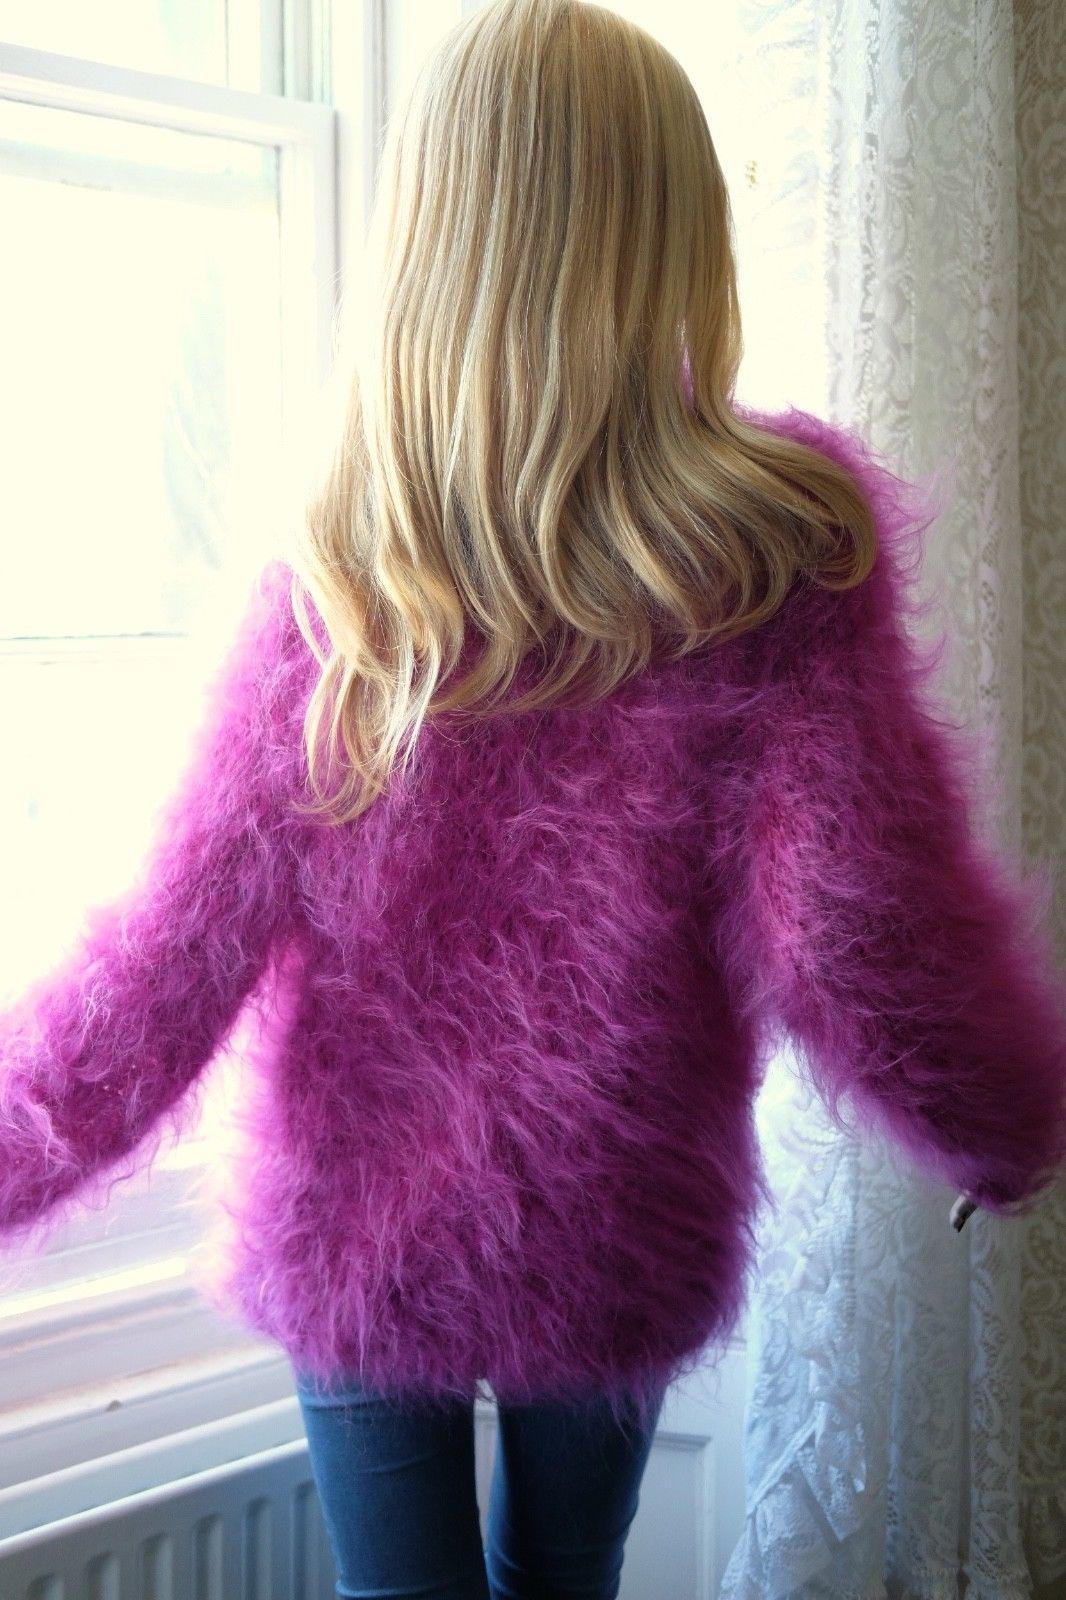 74387066_cardigan-sweater-hot-pink-6.jpg